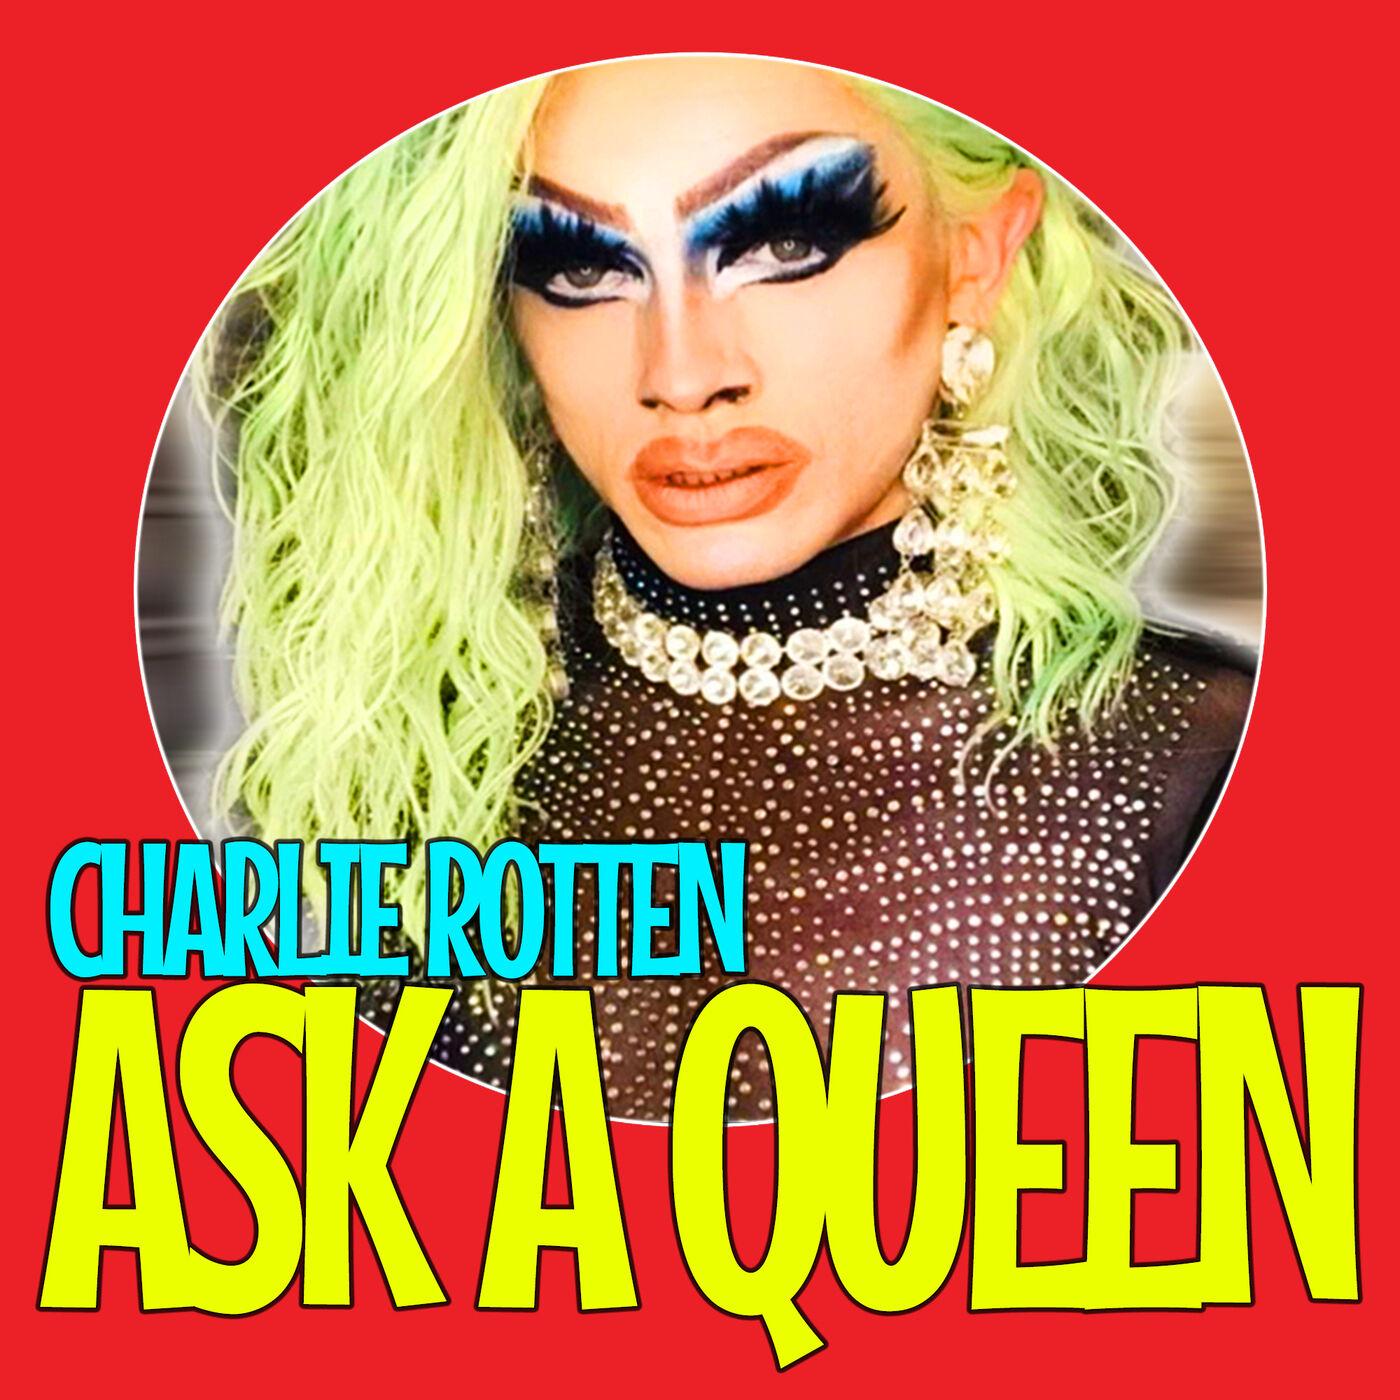 Ask A Queen - Charlie Rotten (Interview)